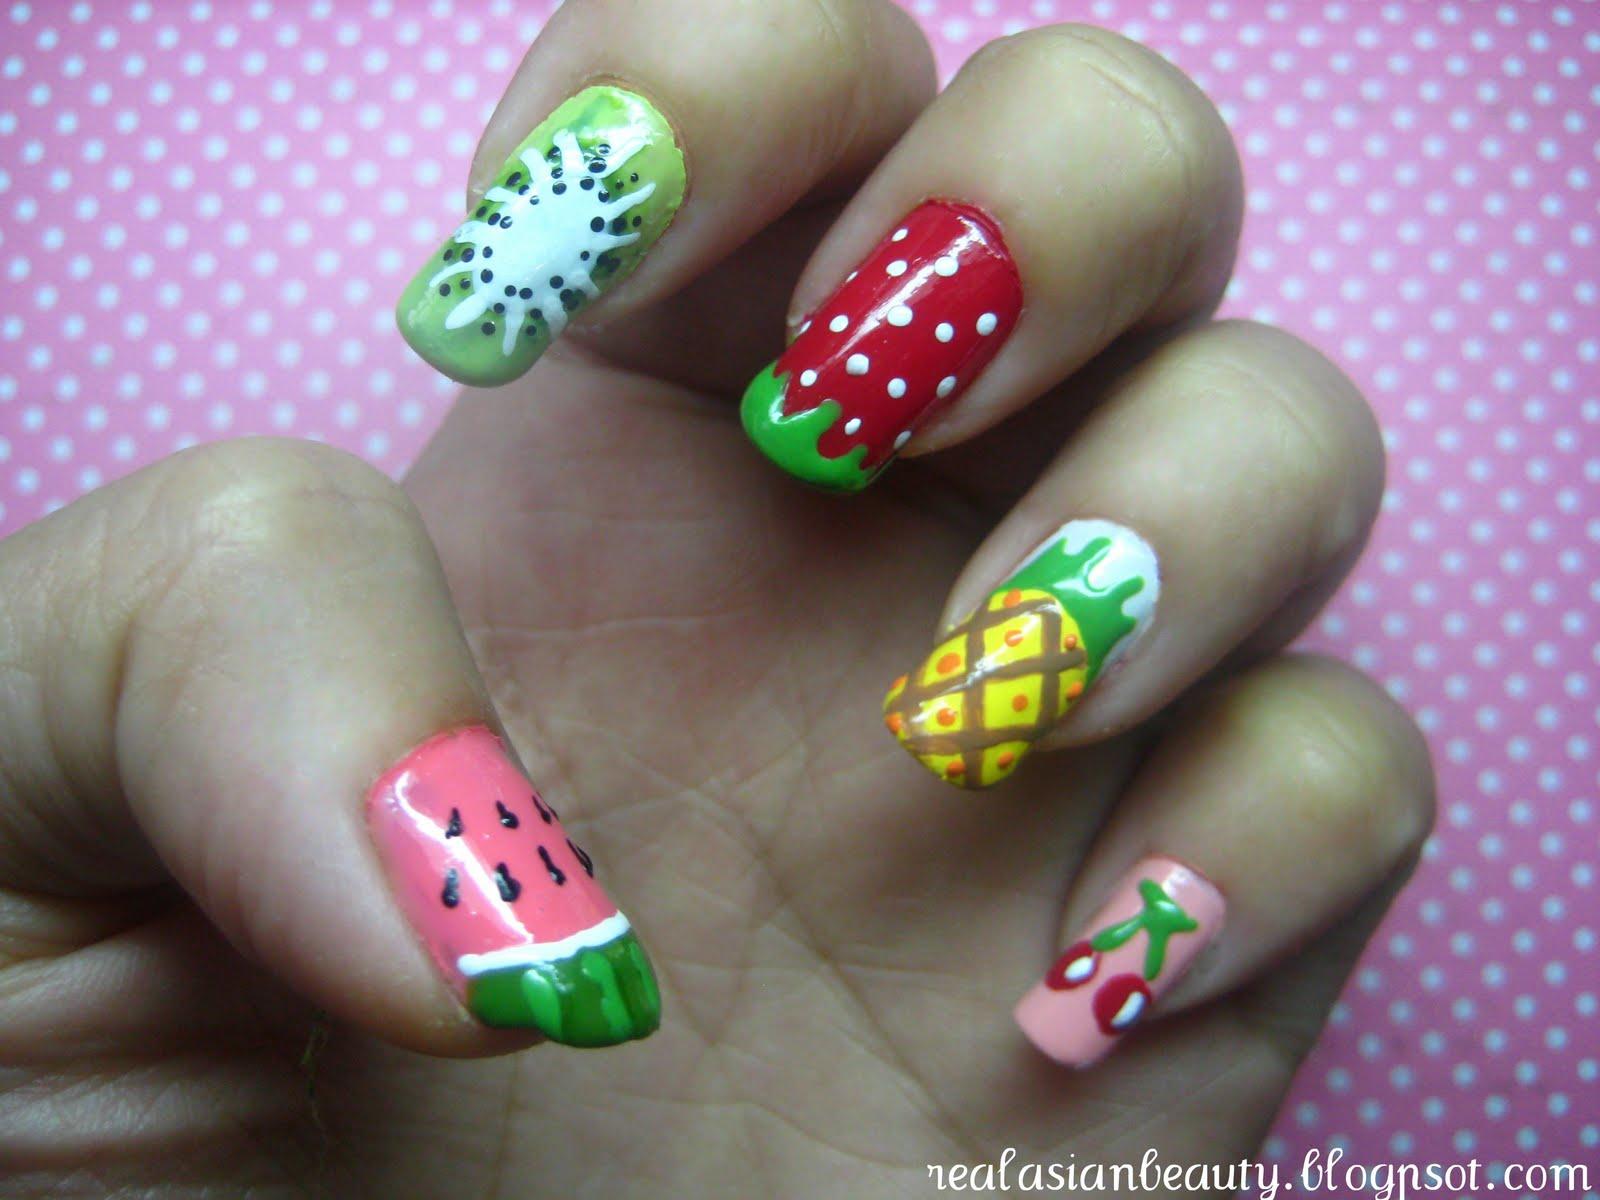 Real Asian Beauty: Summer Fruits Nail Art (Watermelon Kiwi ...